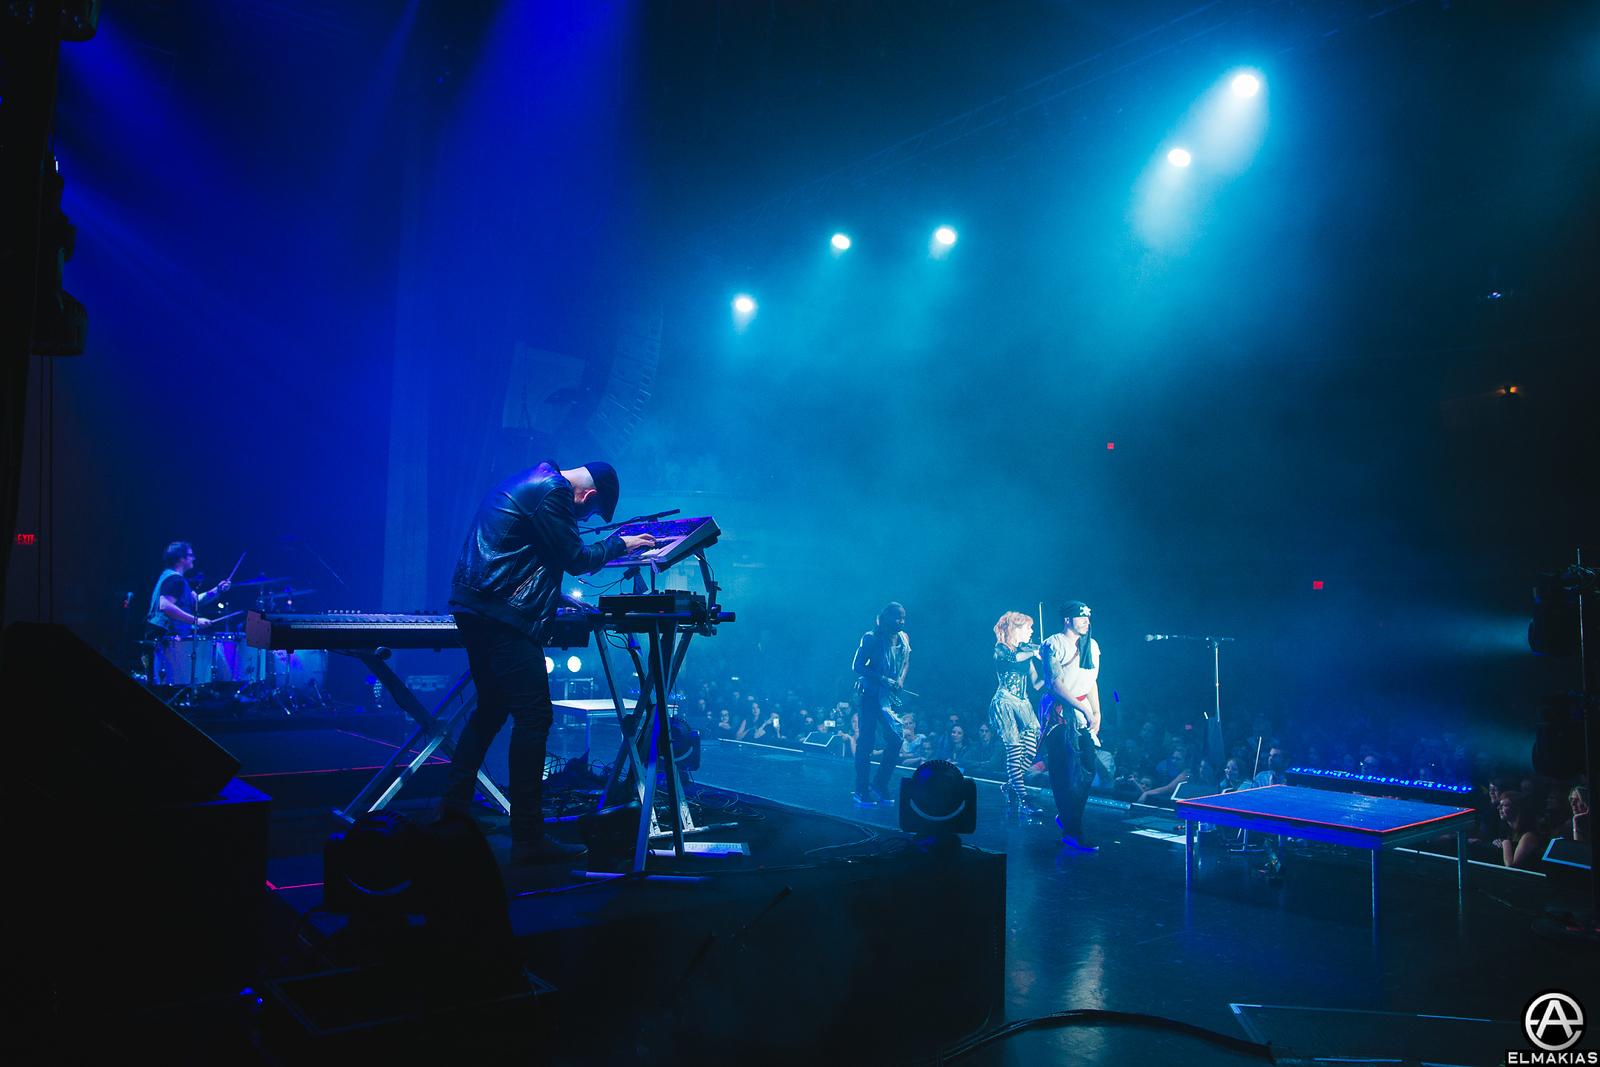 Gavi jamming on the Shatter Me Tour by Adam Elmakias